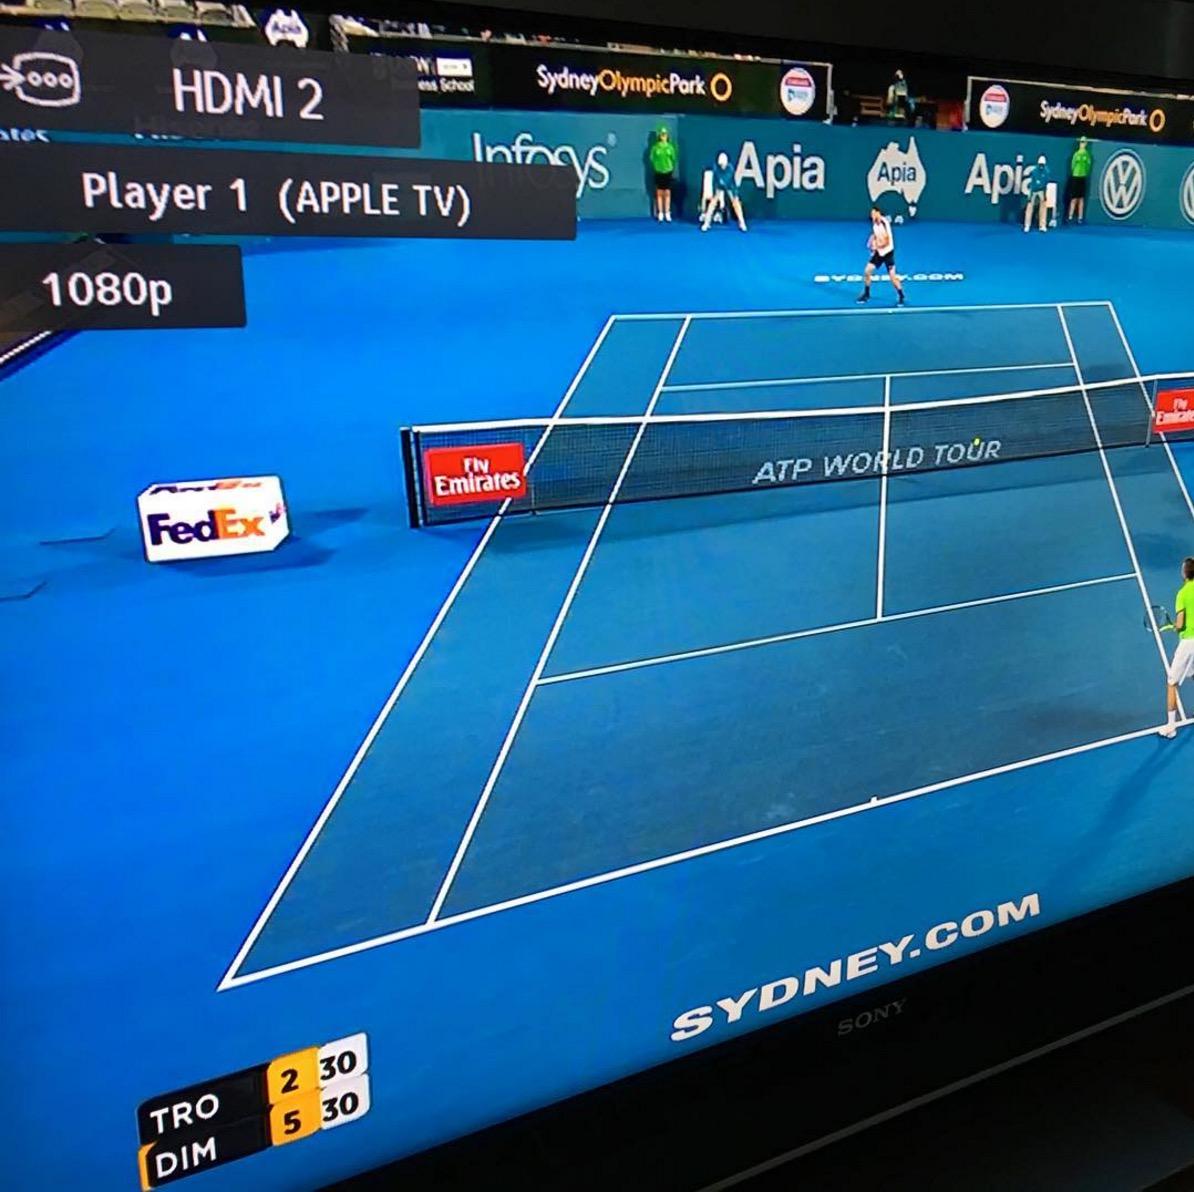 A demonstration of Seven's HD Tennis coverage delivered via AppleTV. image source -  Craig Pickersgill - Instagram